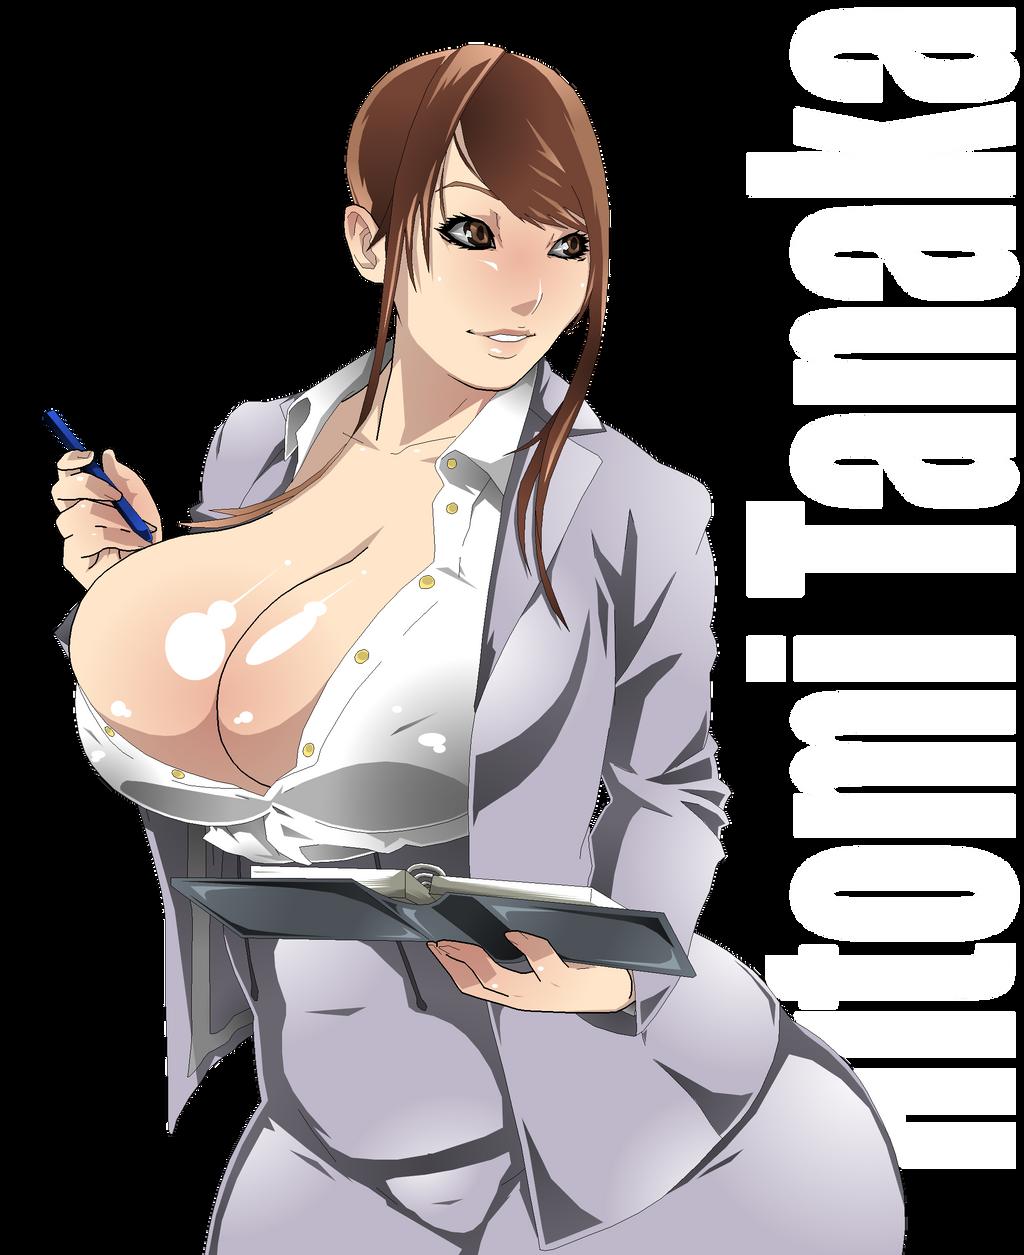 hitomi tanaka anime